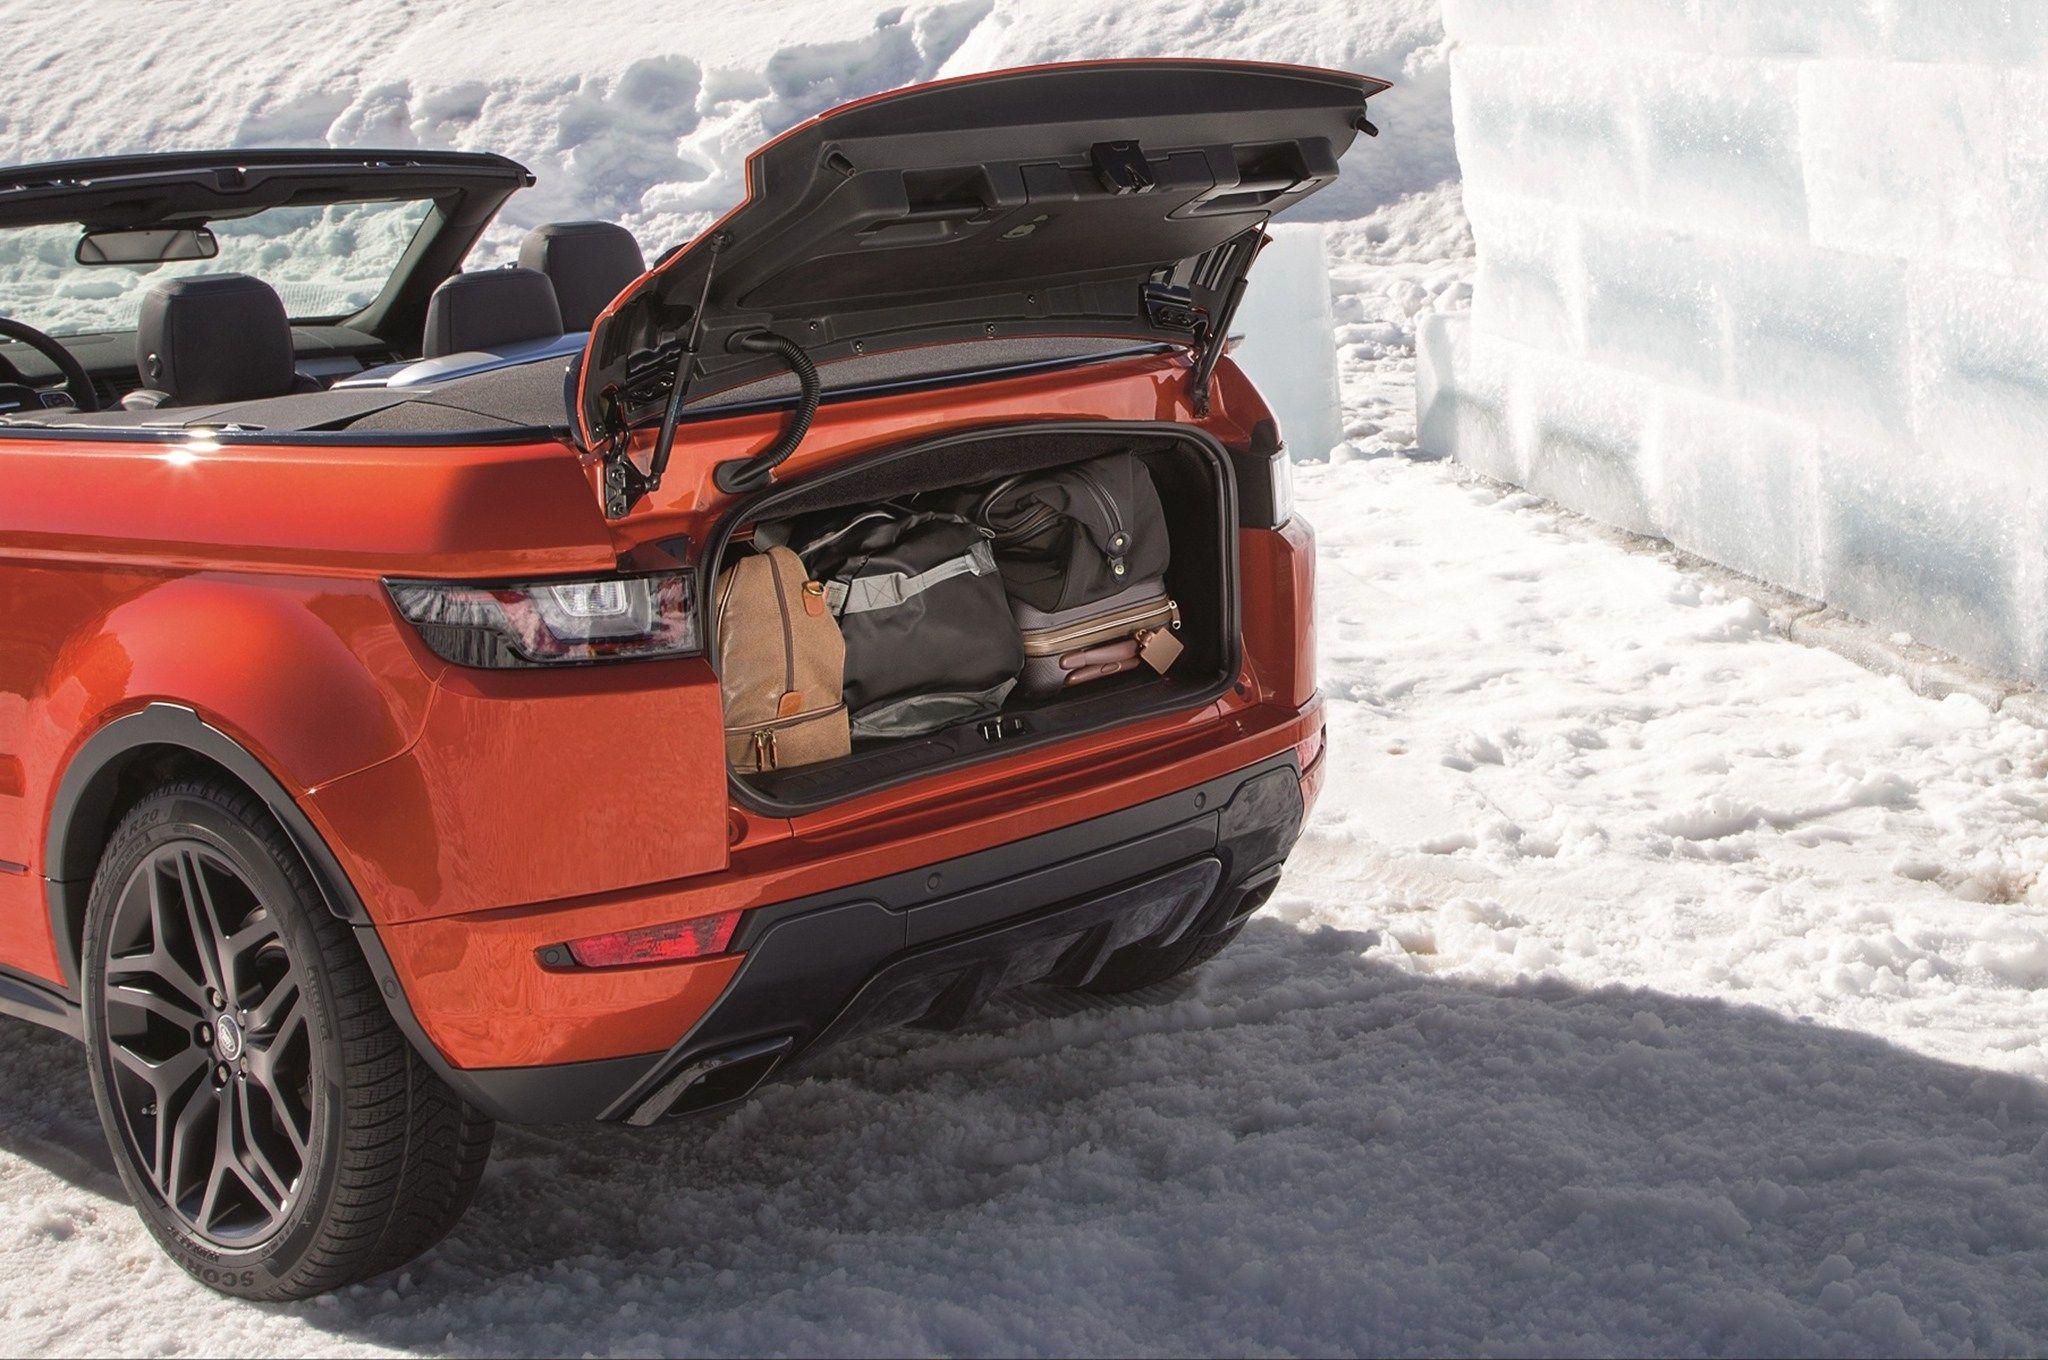 2017 Range Rover Evoque Convertible First Look Land